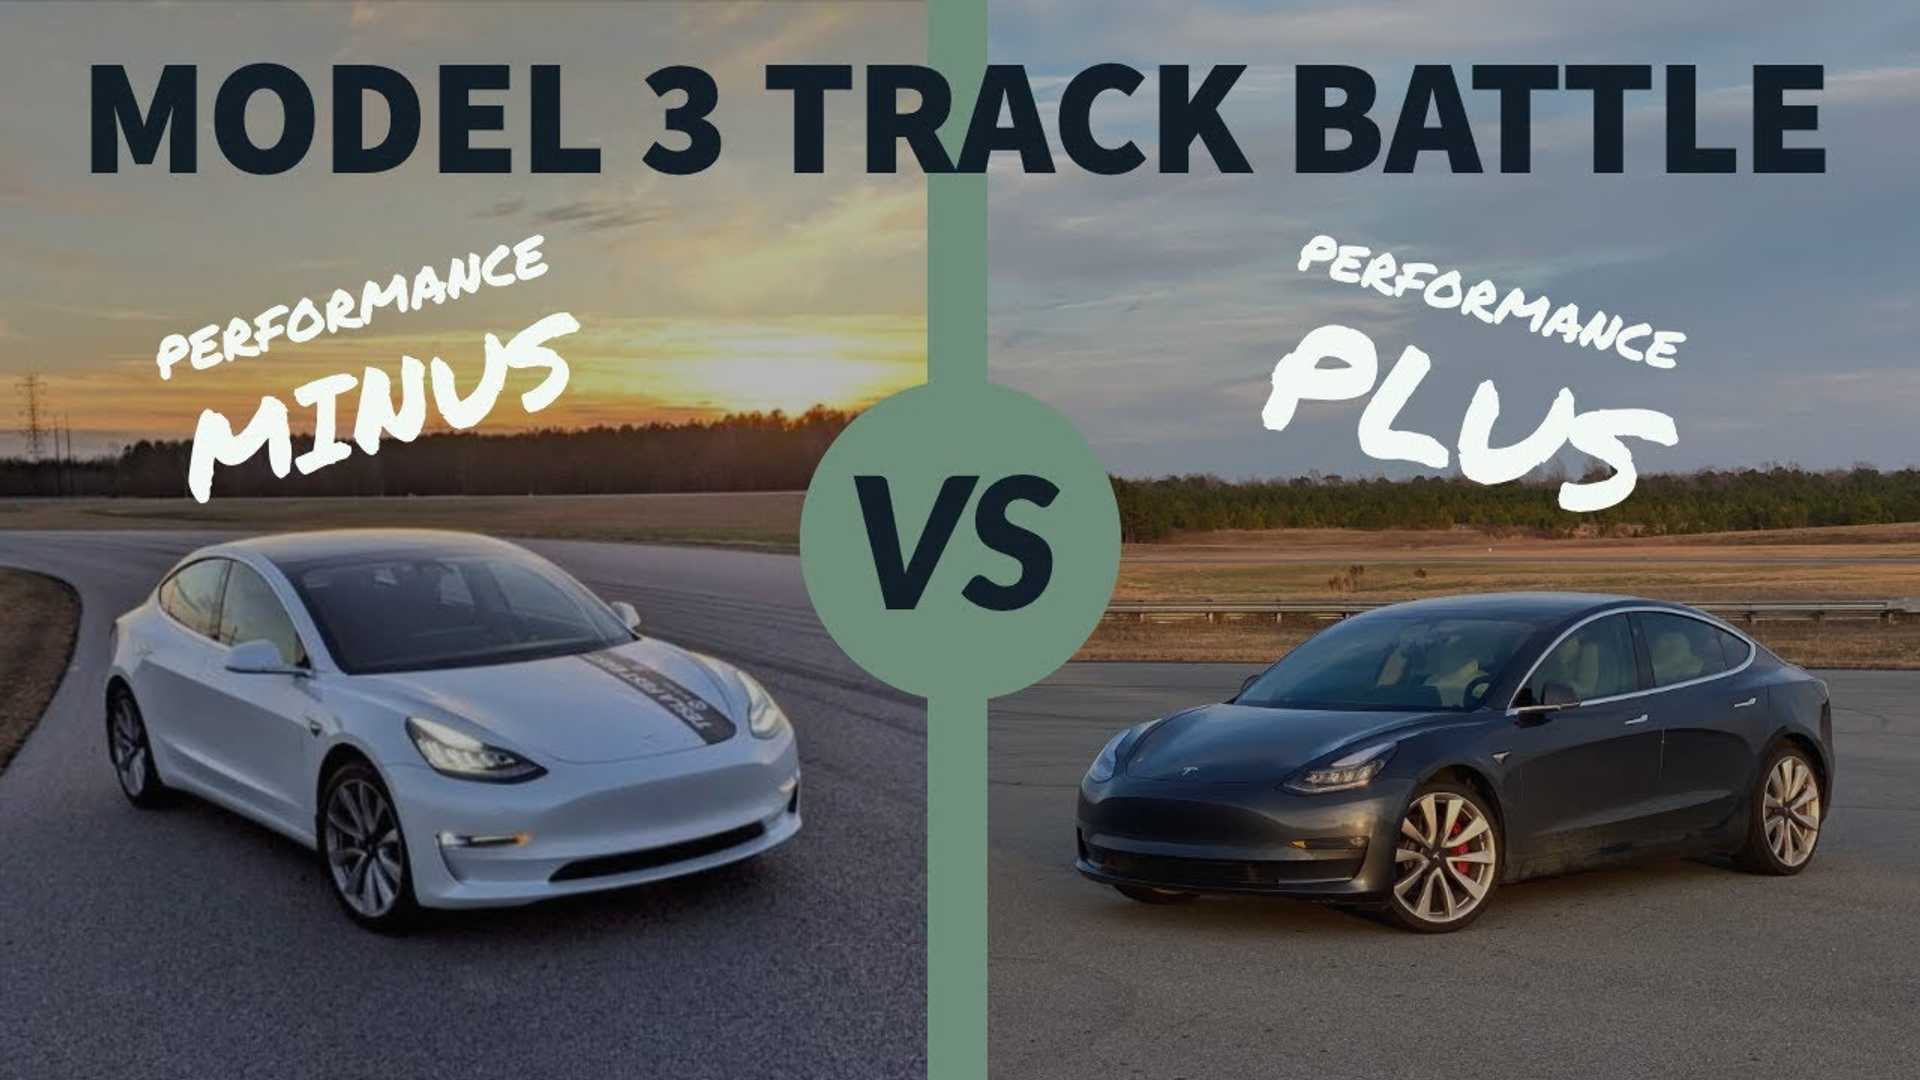 Tesla Model 3 Performance 'Upgrades' Car Vs Model 3P 'Sleeper'